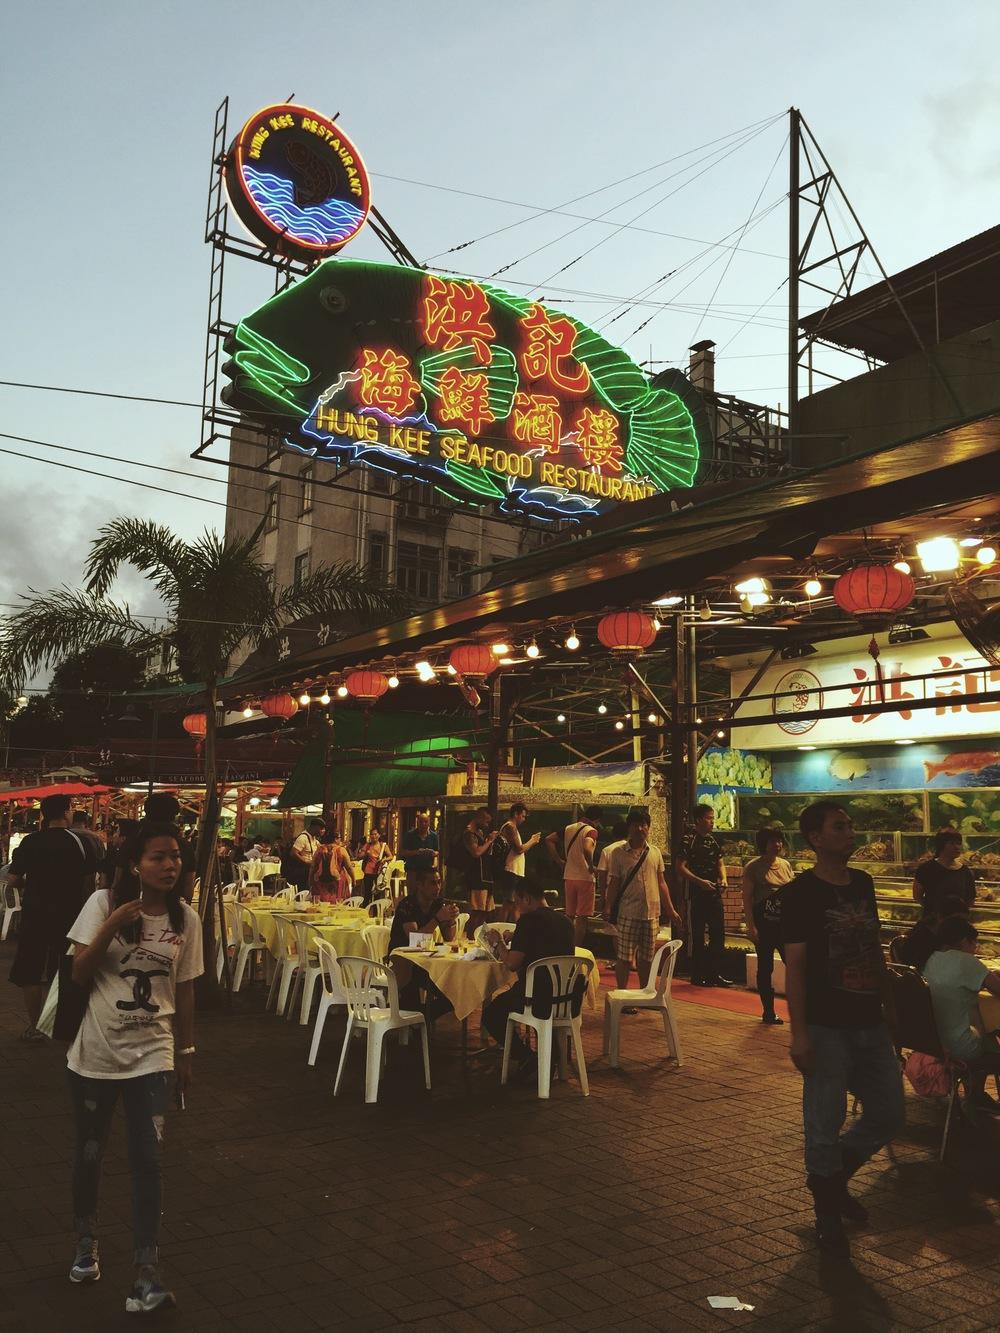 Open-air seafood restaurants line the boardwalk.